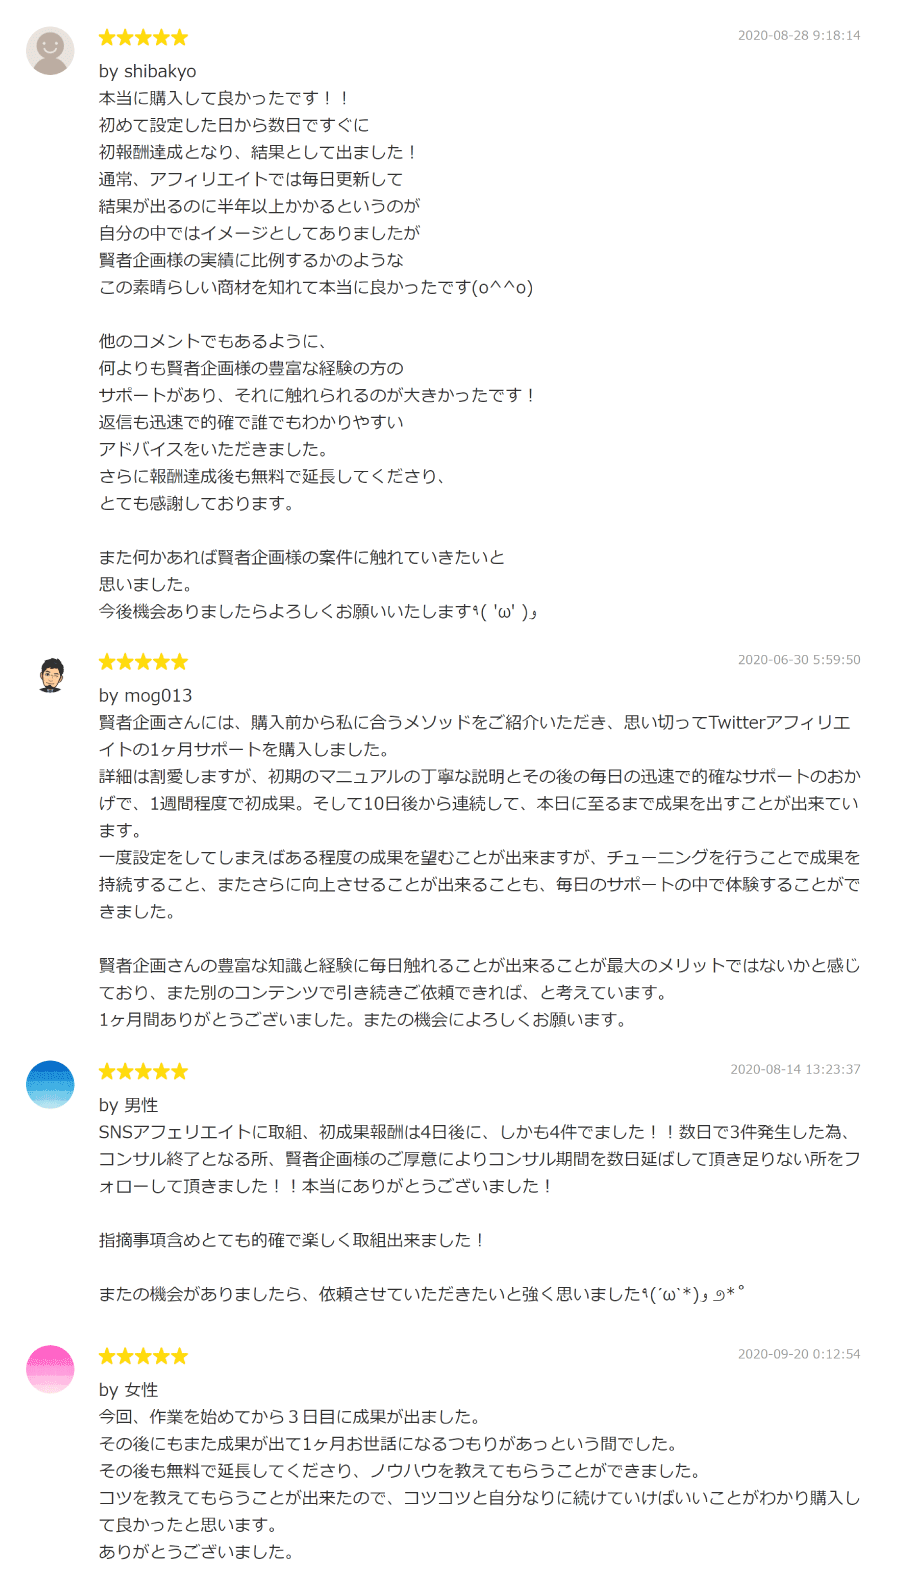 Twitterアフィリエイト(ココナラ感想)